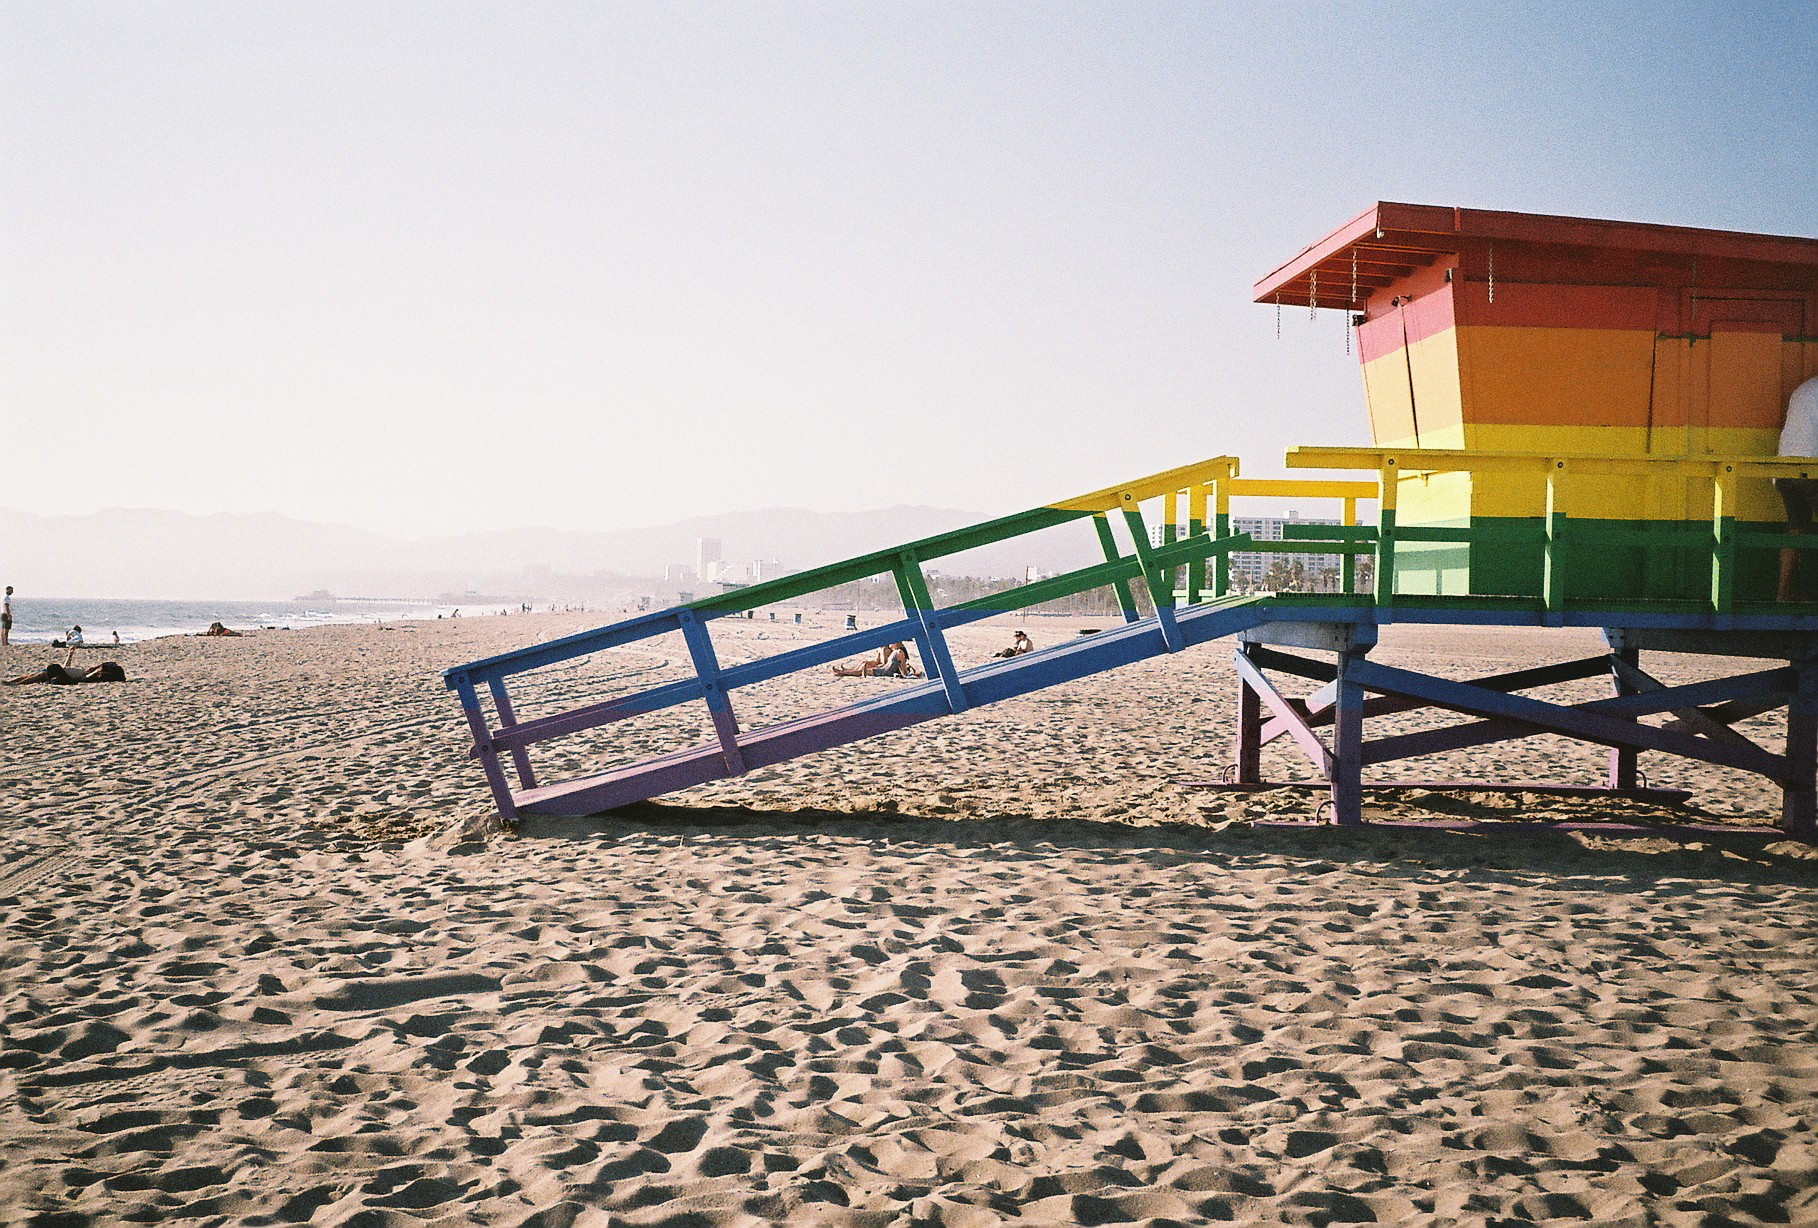 LOS_ANGELES_VENICE_SKATEPARK_TEALMAGAZINE